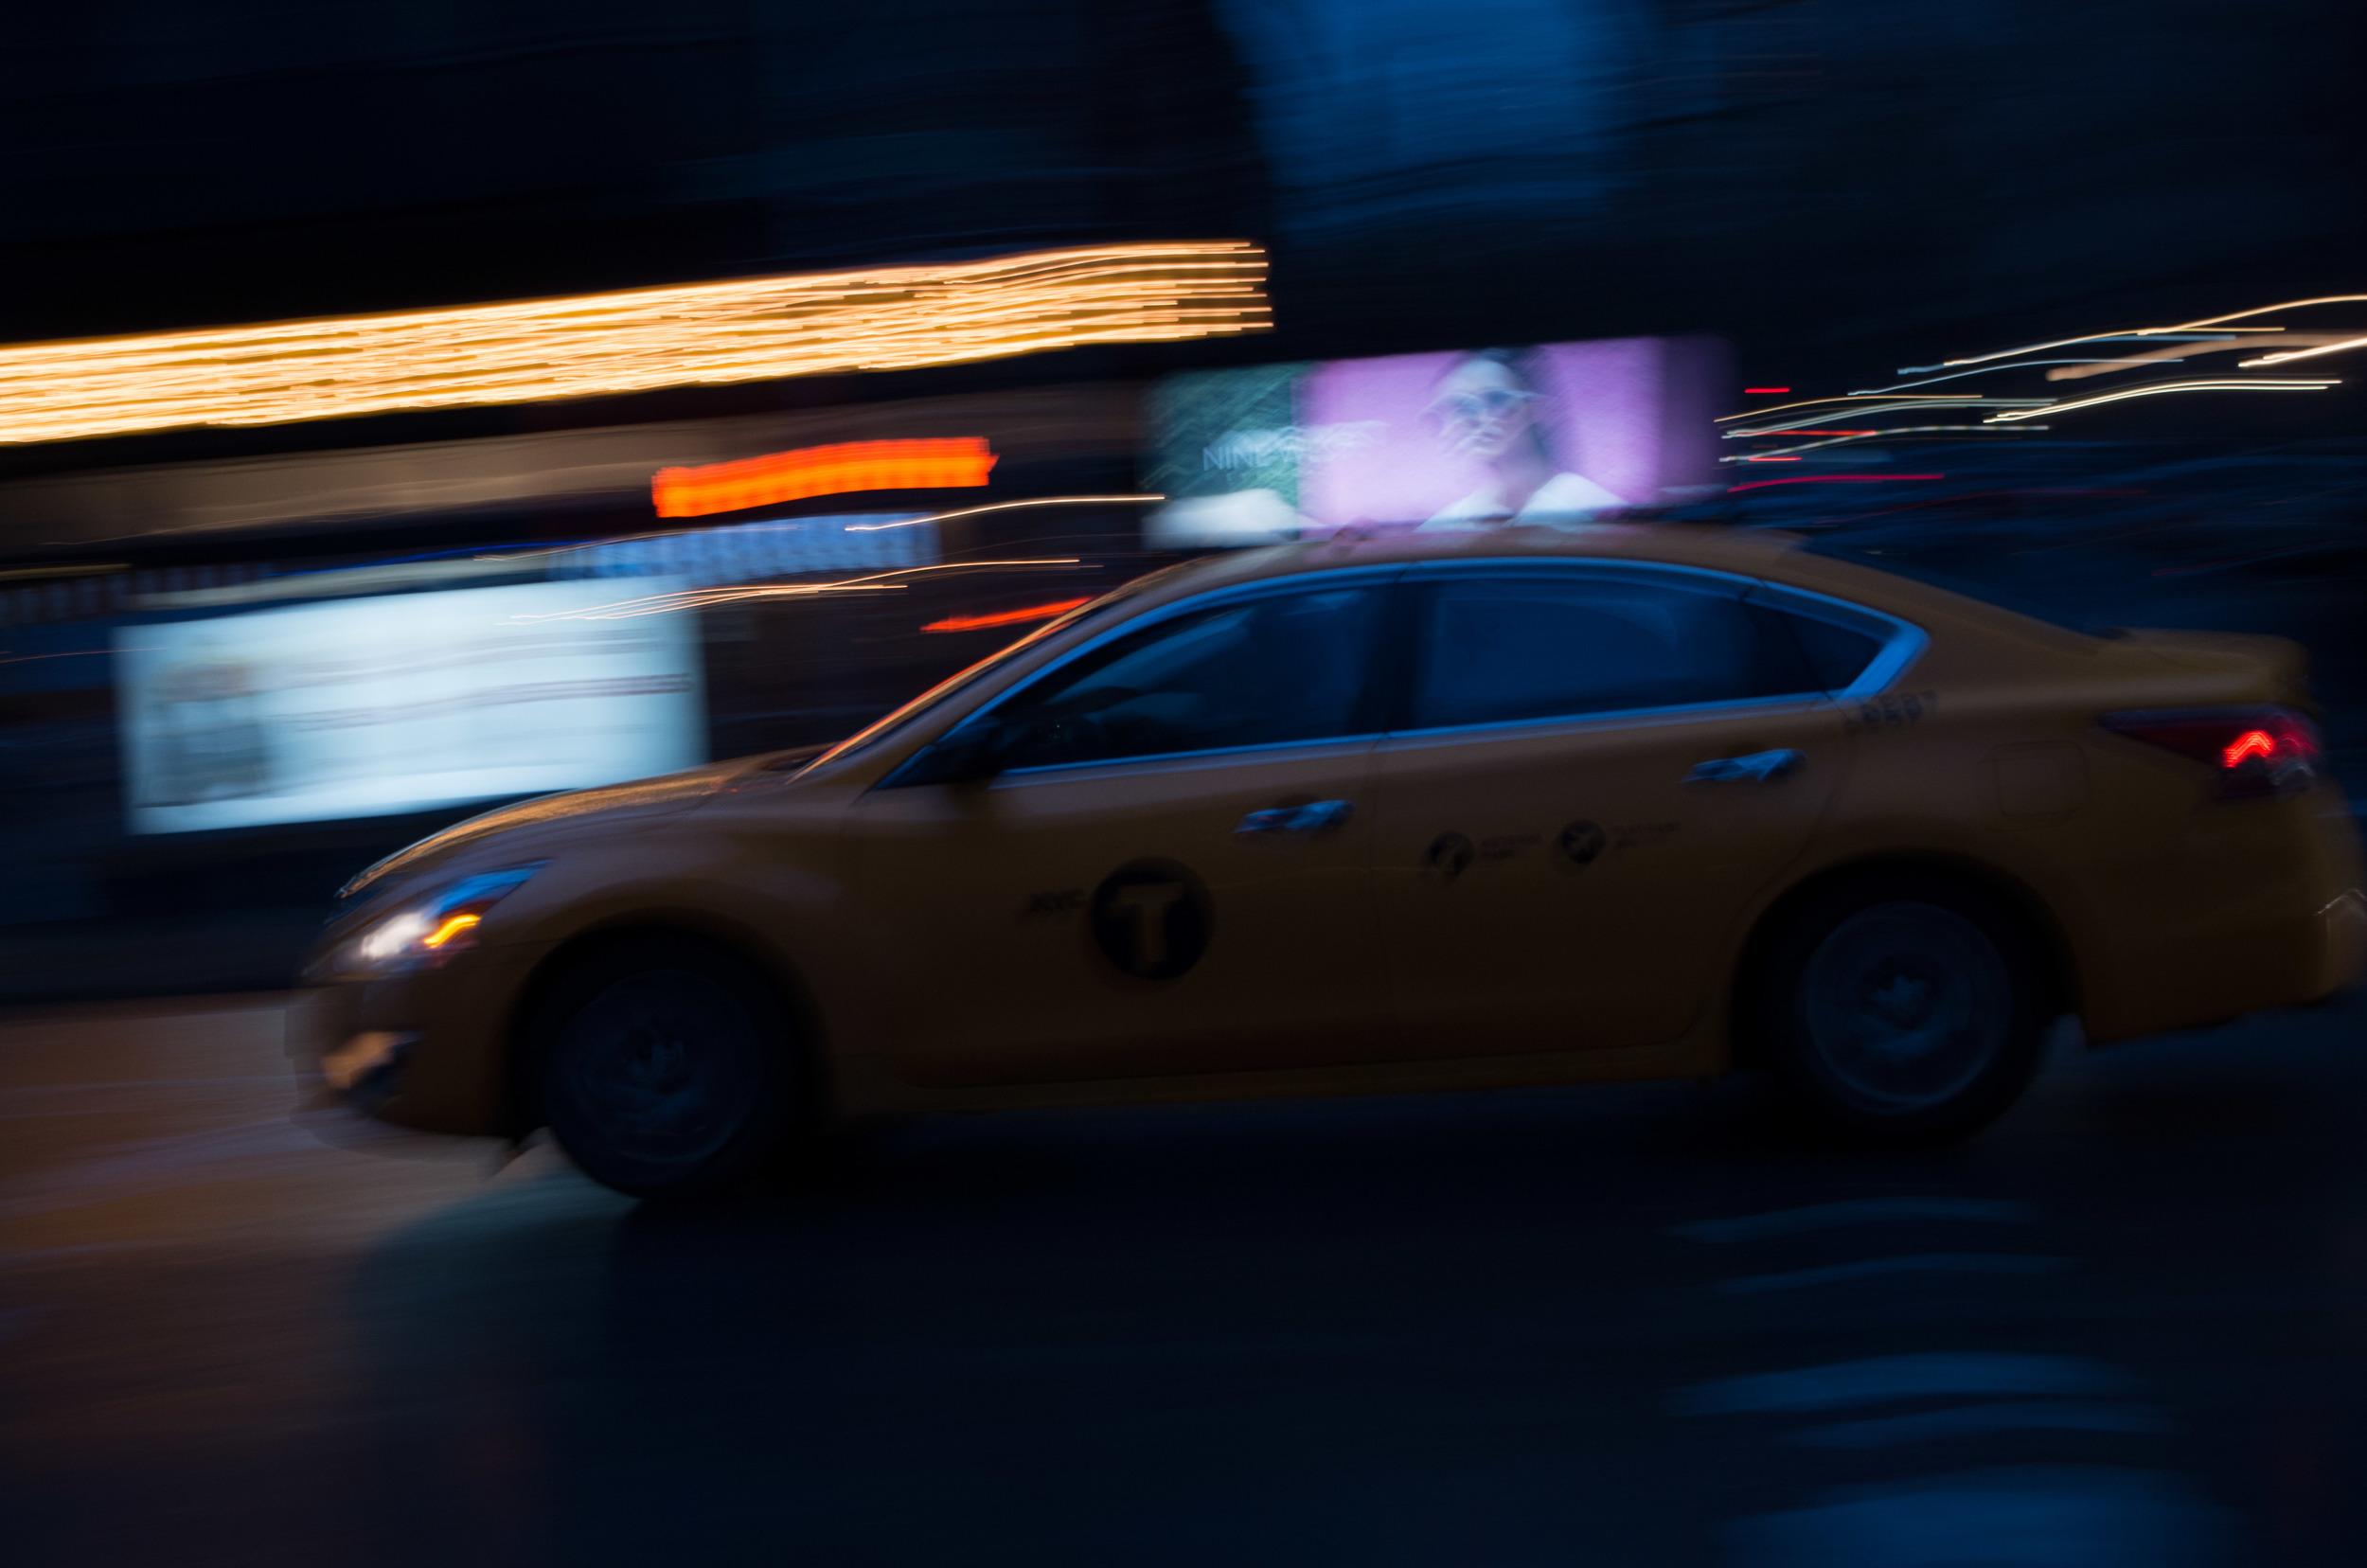 Untitled: NYC Cab | 4.11.16